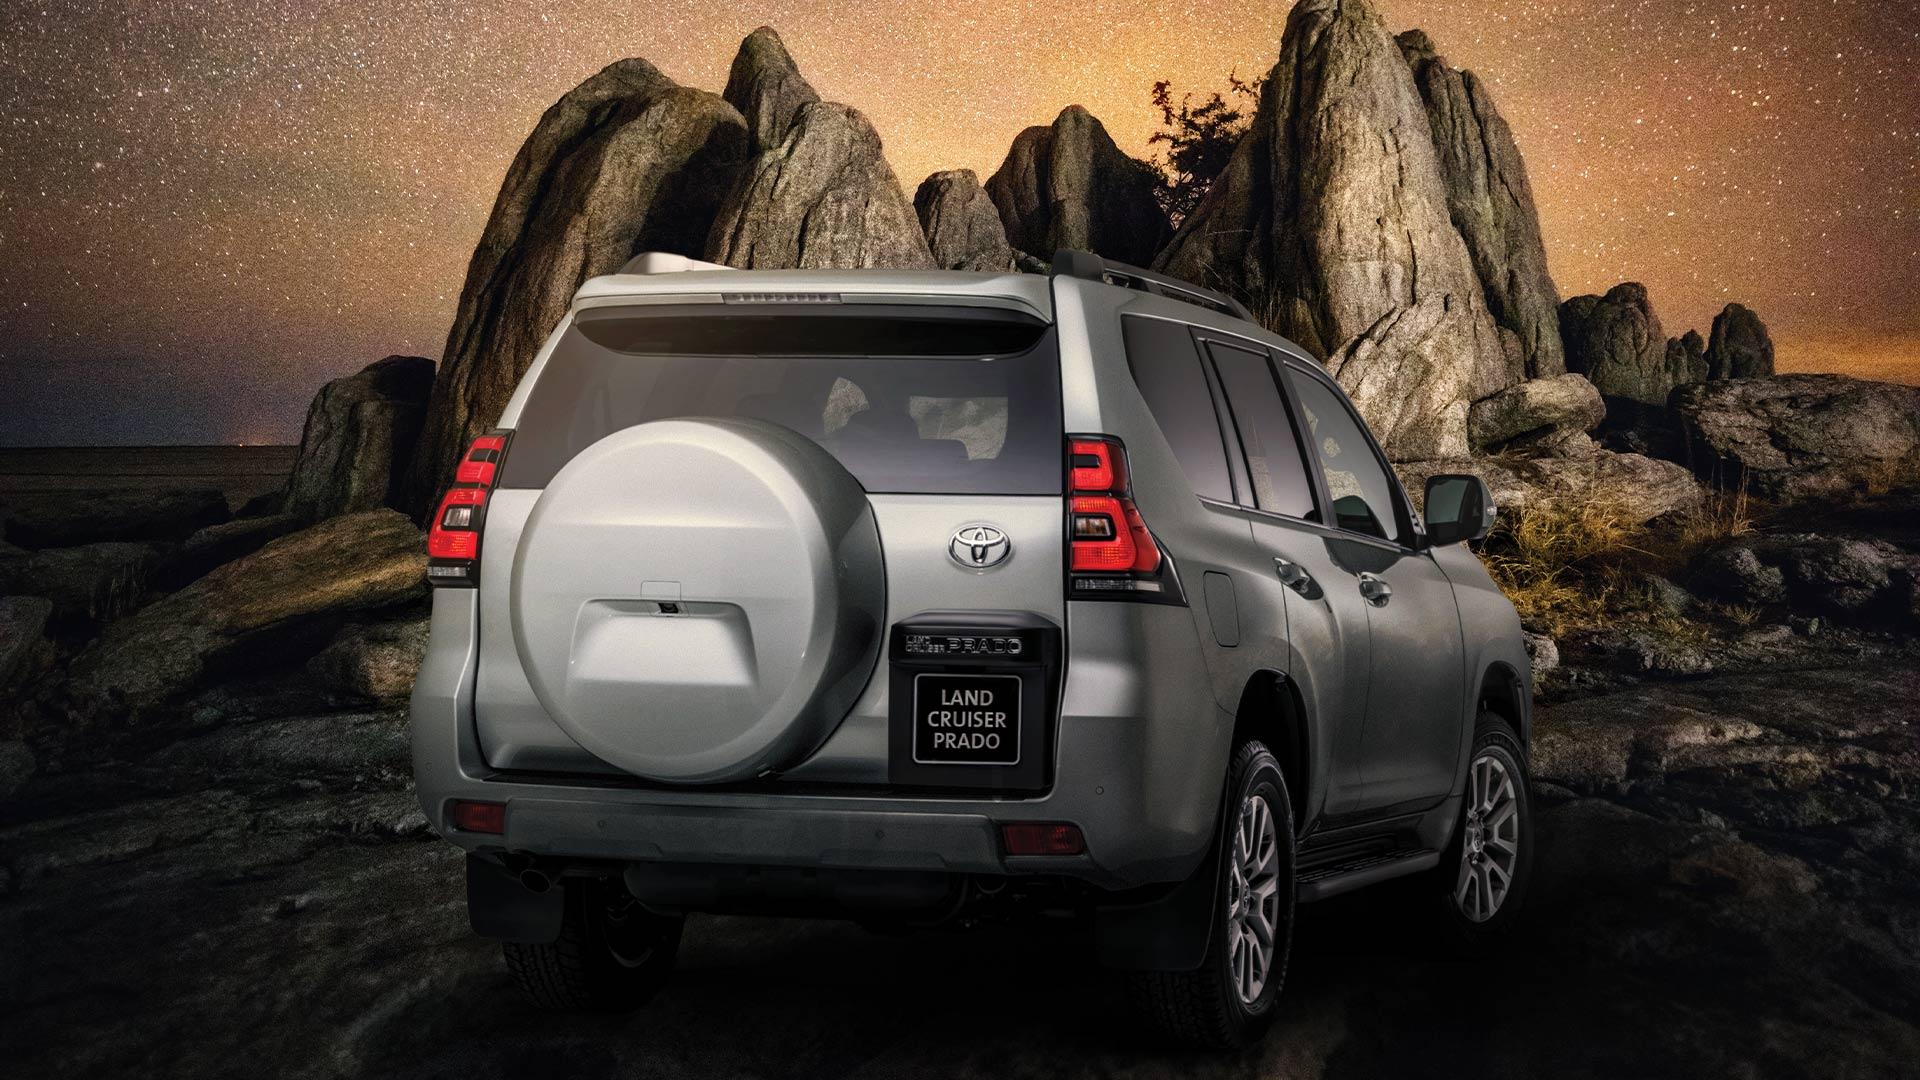 Toyota unveils the new Land Cruiser Prado